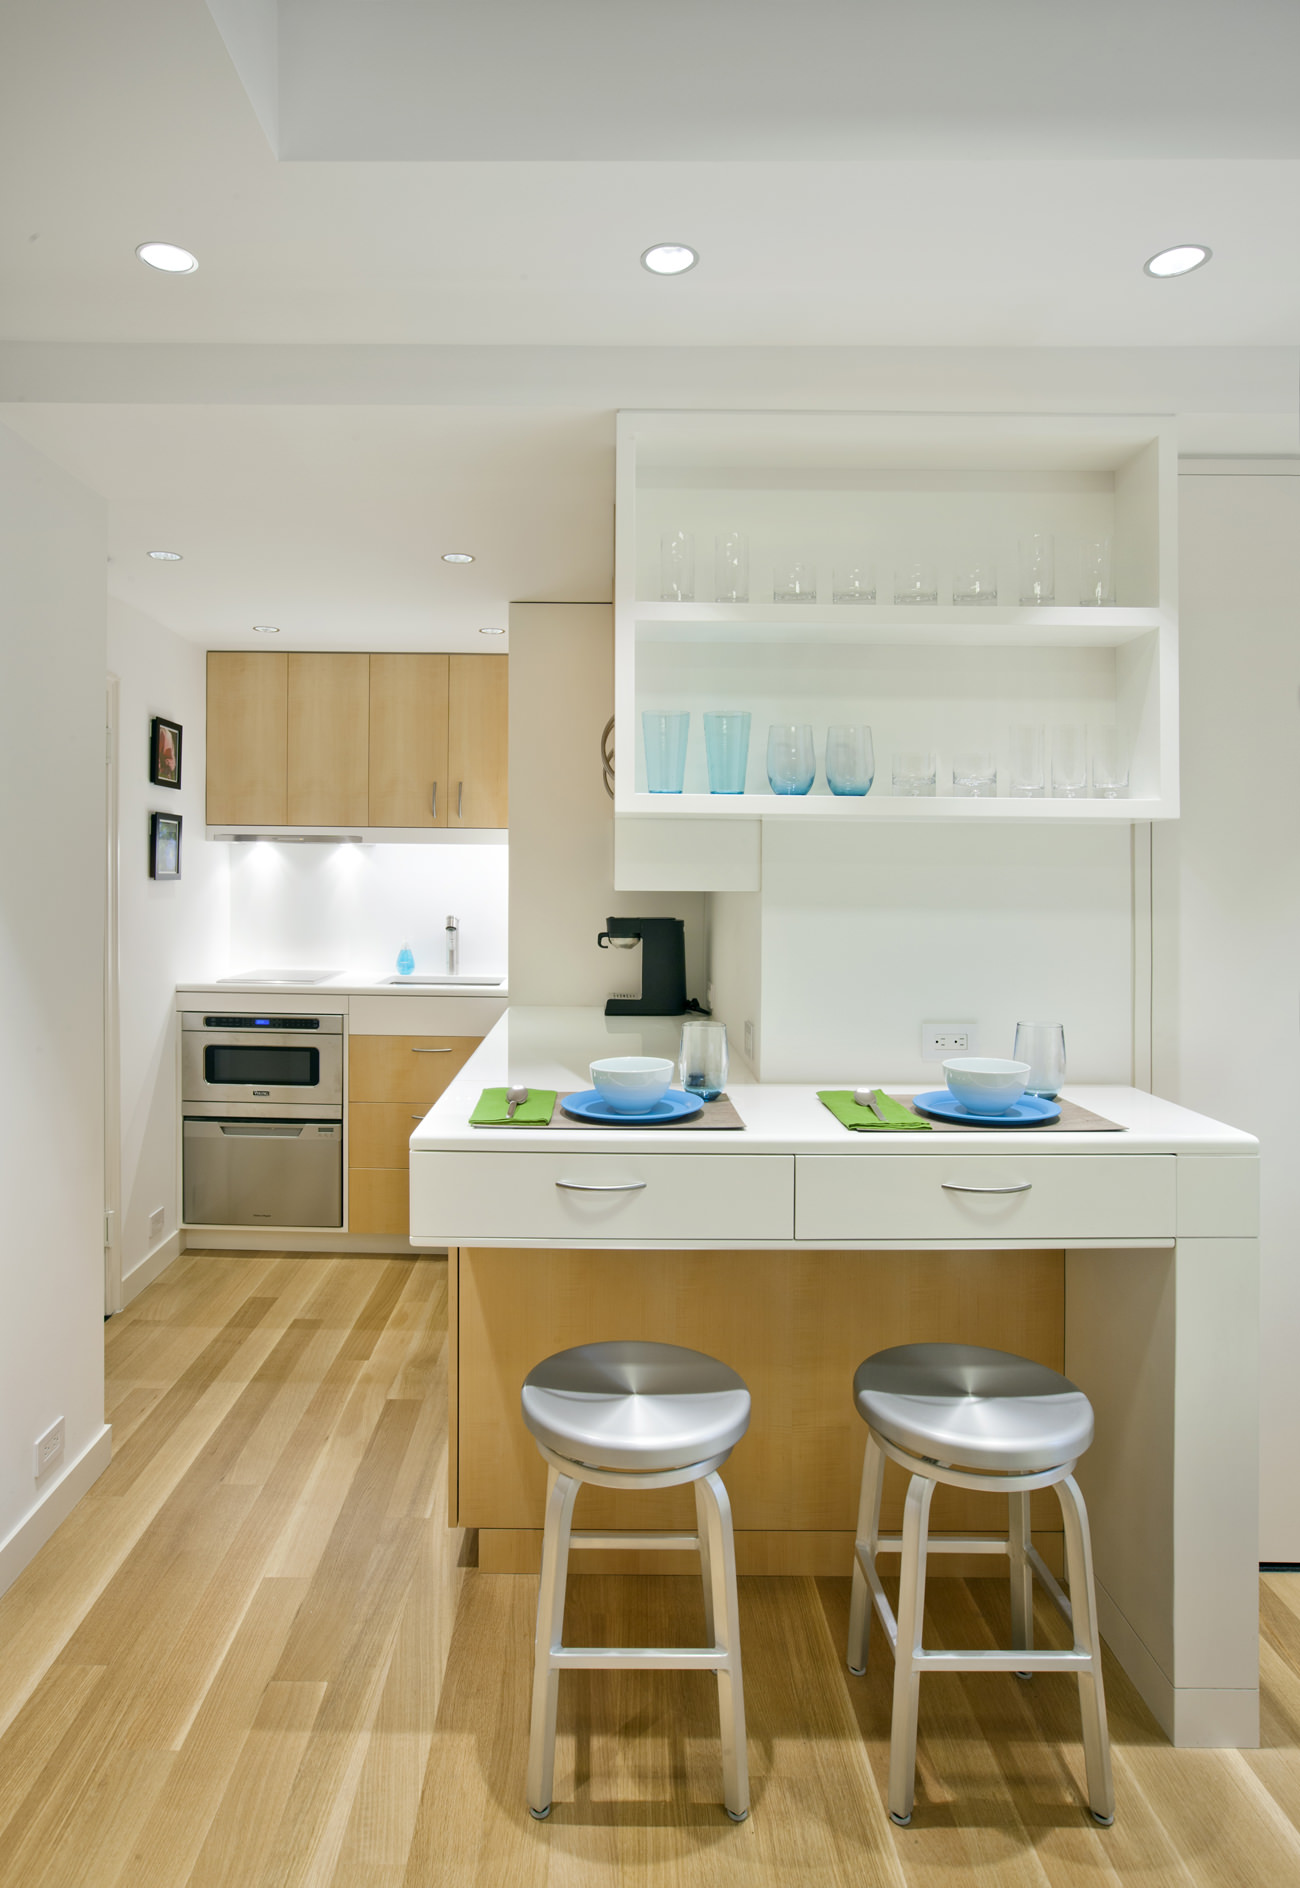 Studio Apartment New York City new york city micro-apartment | allen + killcoyne architects